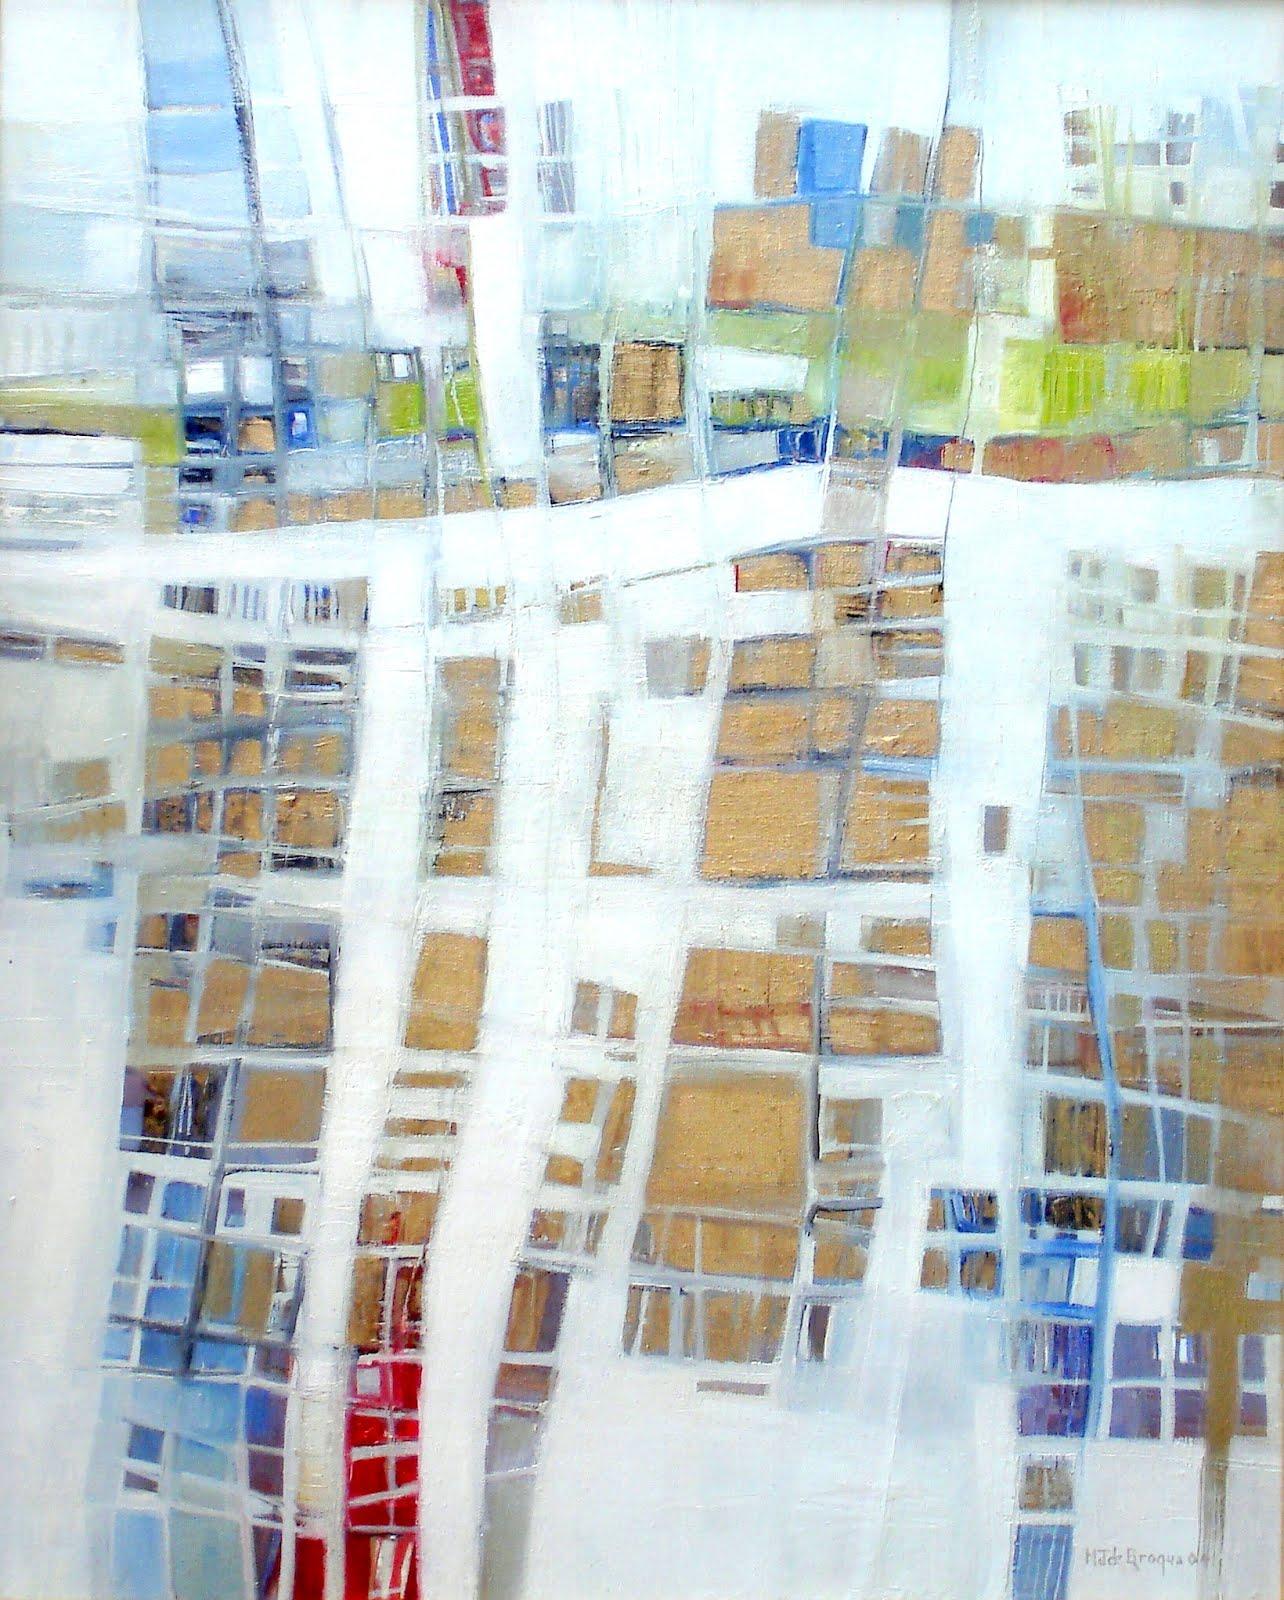 My Angel - Hommage à Archie Shepp - 65 x 81 cm - 2004